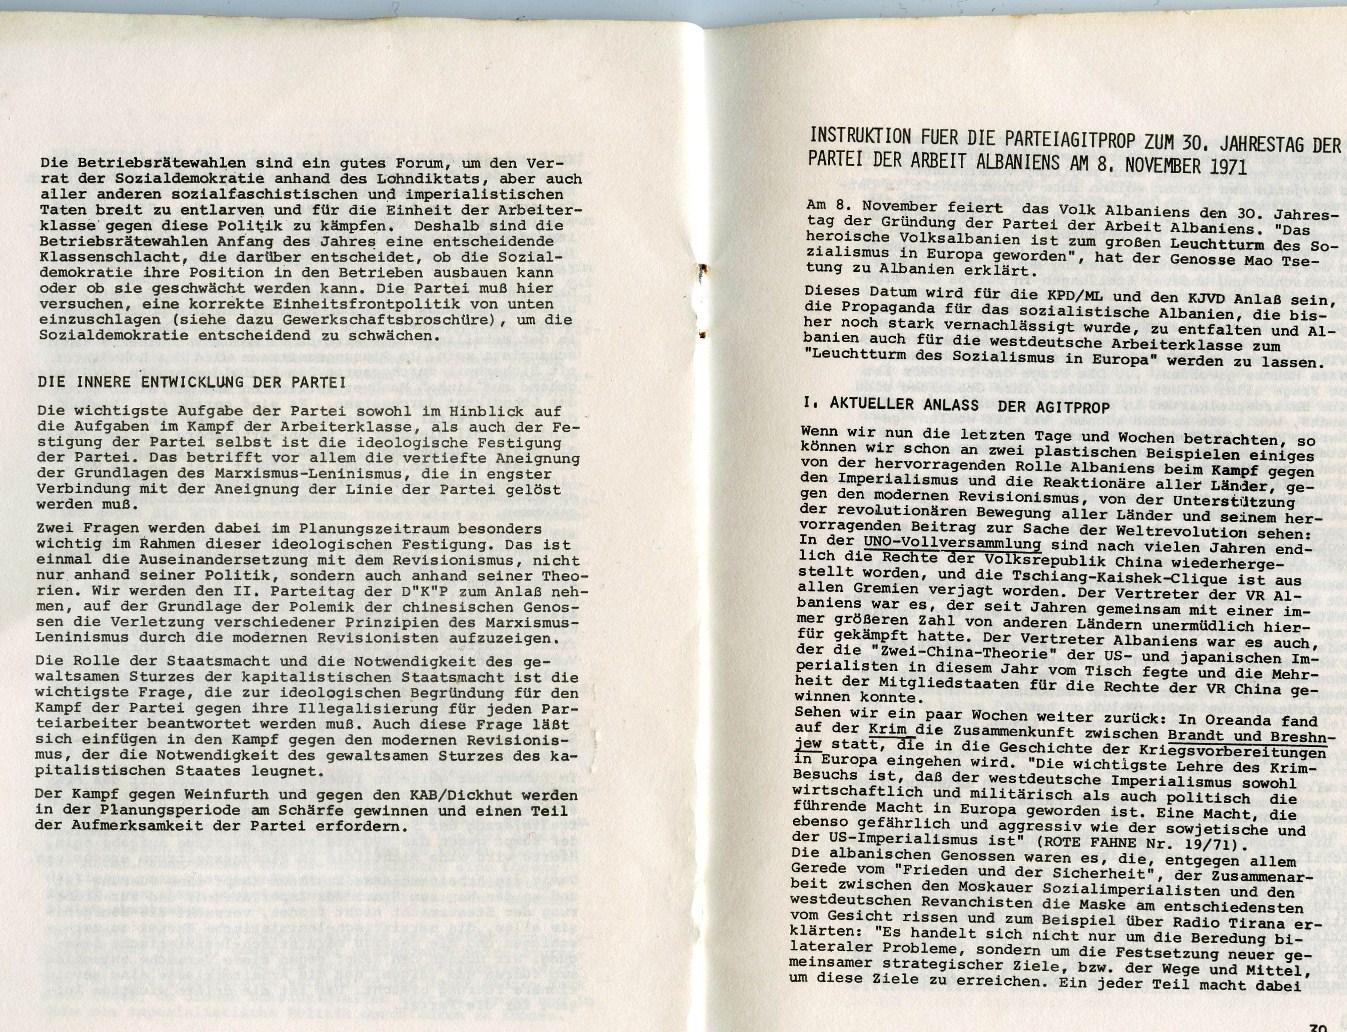 ZB_Parteiarbeiter_1971_09_20